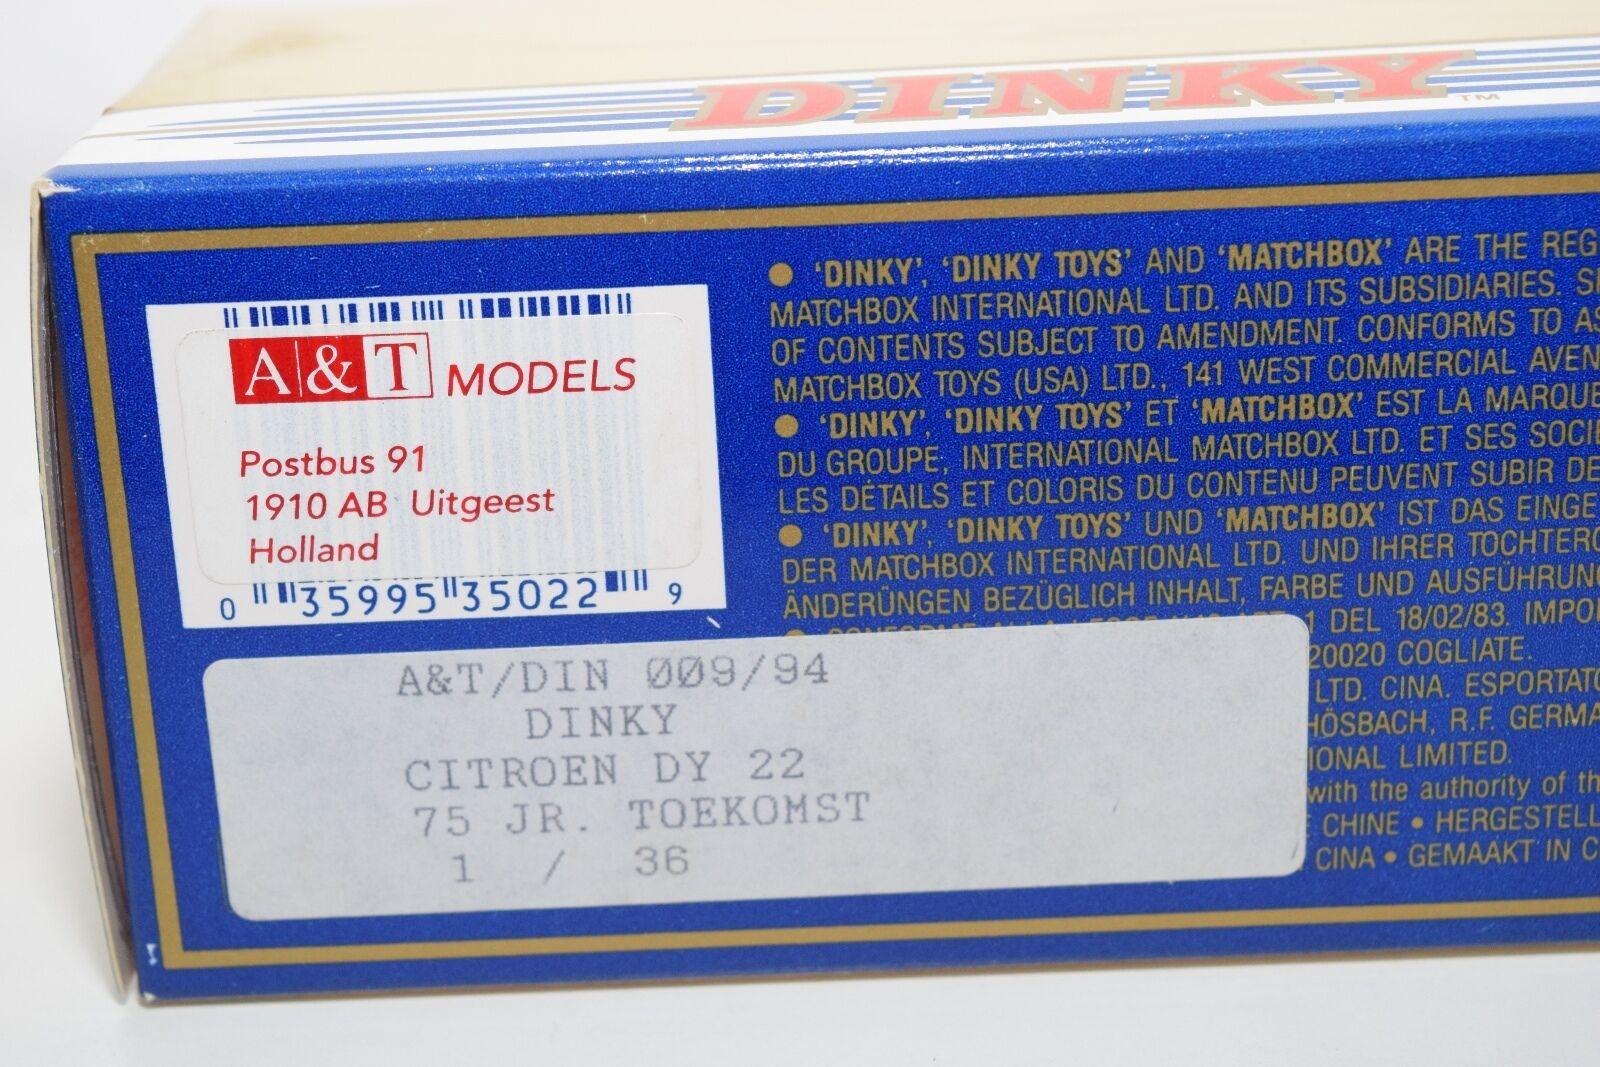 DINKY MATCHBOX DY-22 CITROEN 15 CV CV CV 75 JAAR TOEKOMST NEDERLAND MINT BOXED 06832e